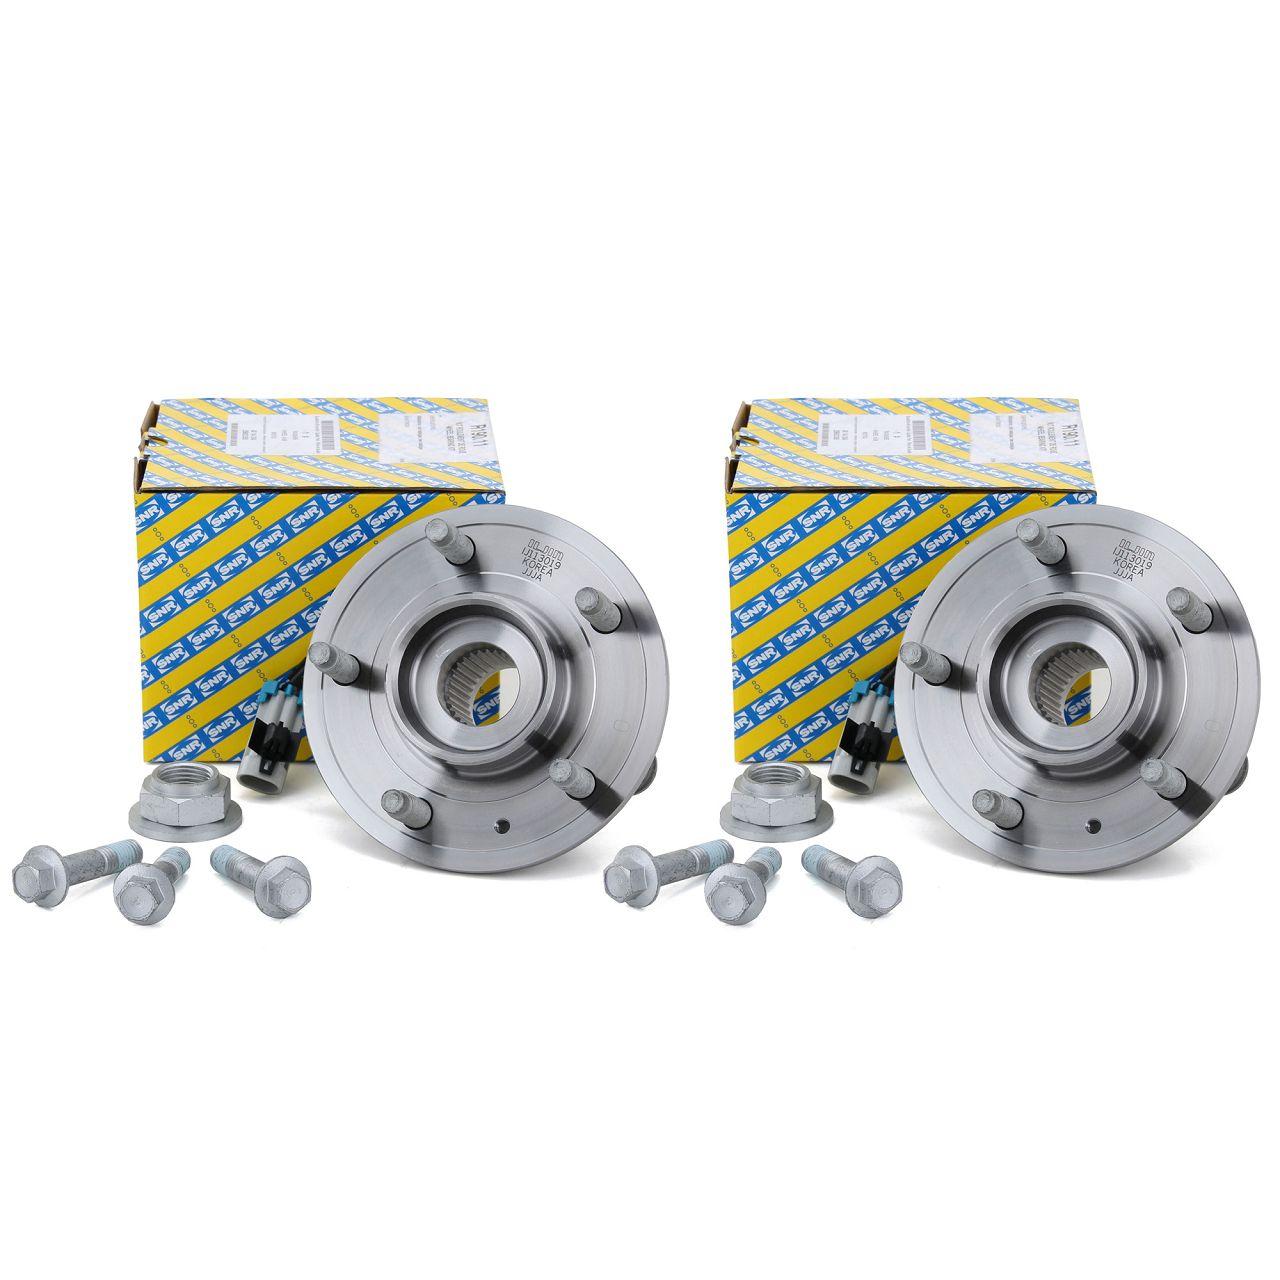 2x SNR R190.11 Radlagersatz OPEL Antara CHEVROLET Captiva (C100 C140) vorne